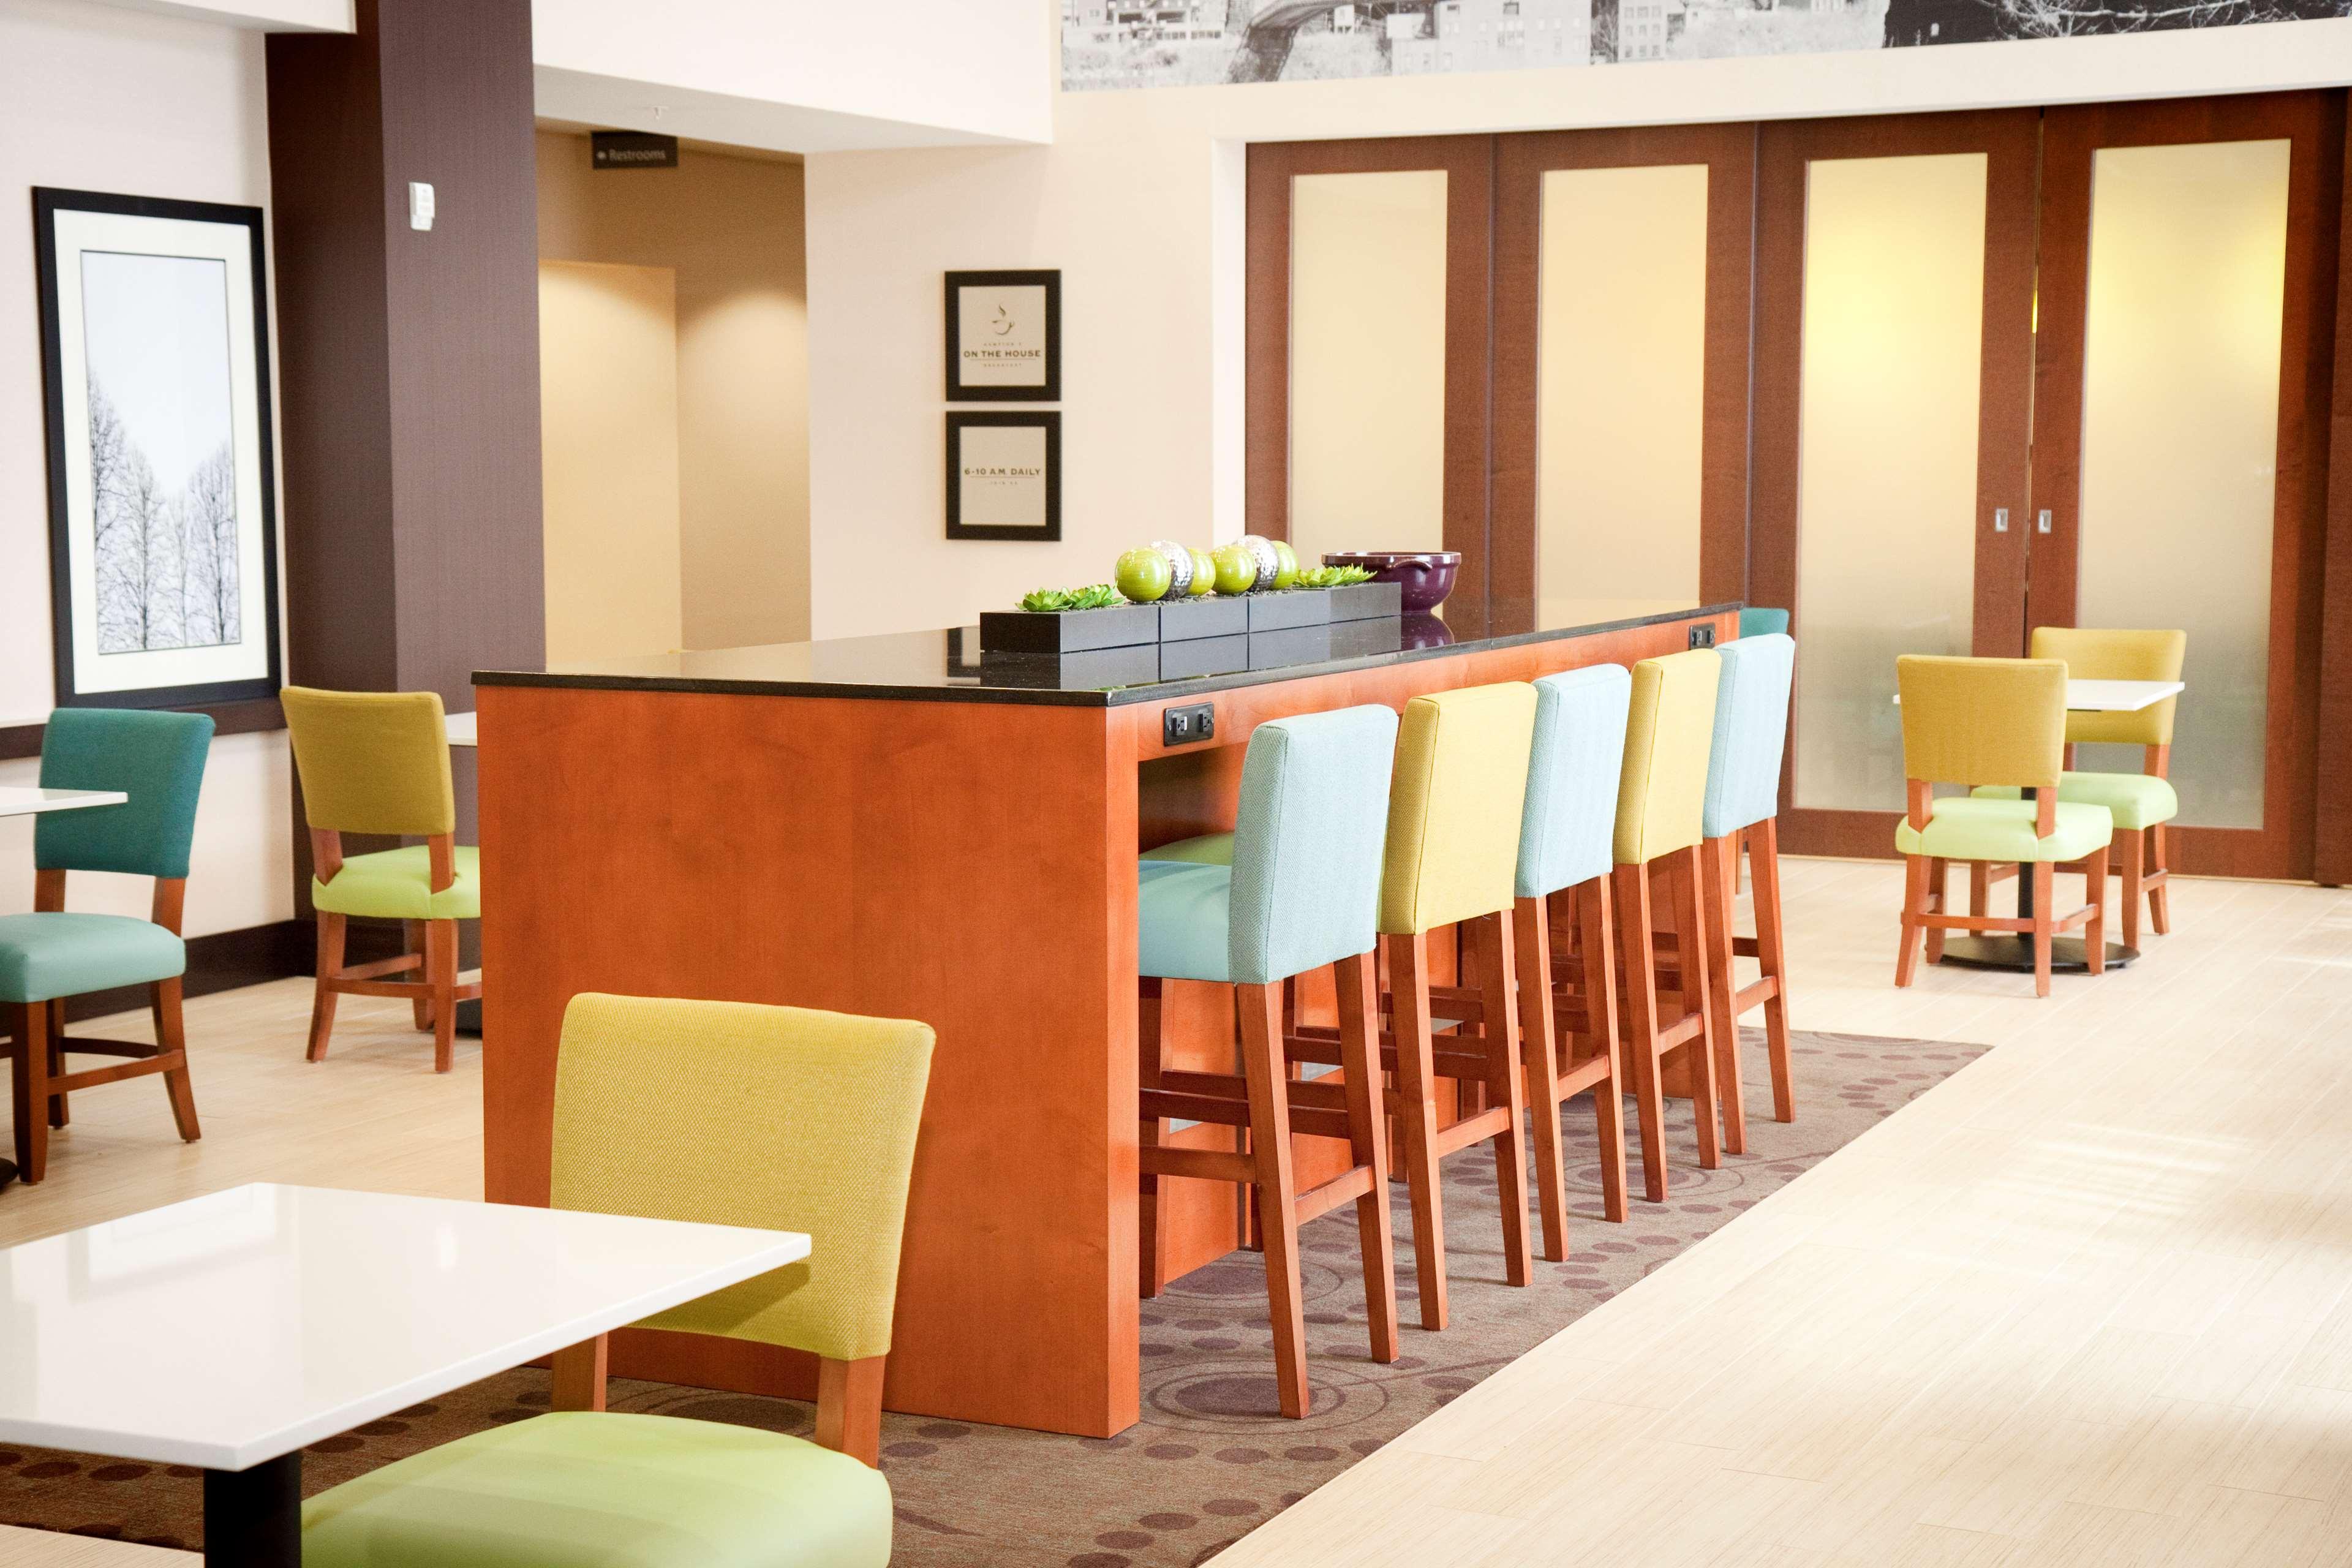 Hampton Inn & Suites Wheeling-The Highlands image 2